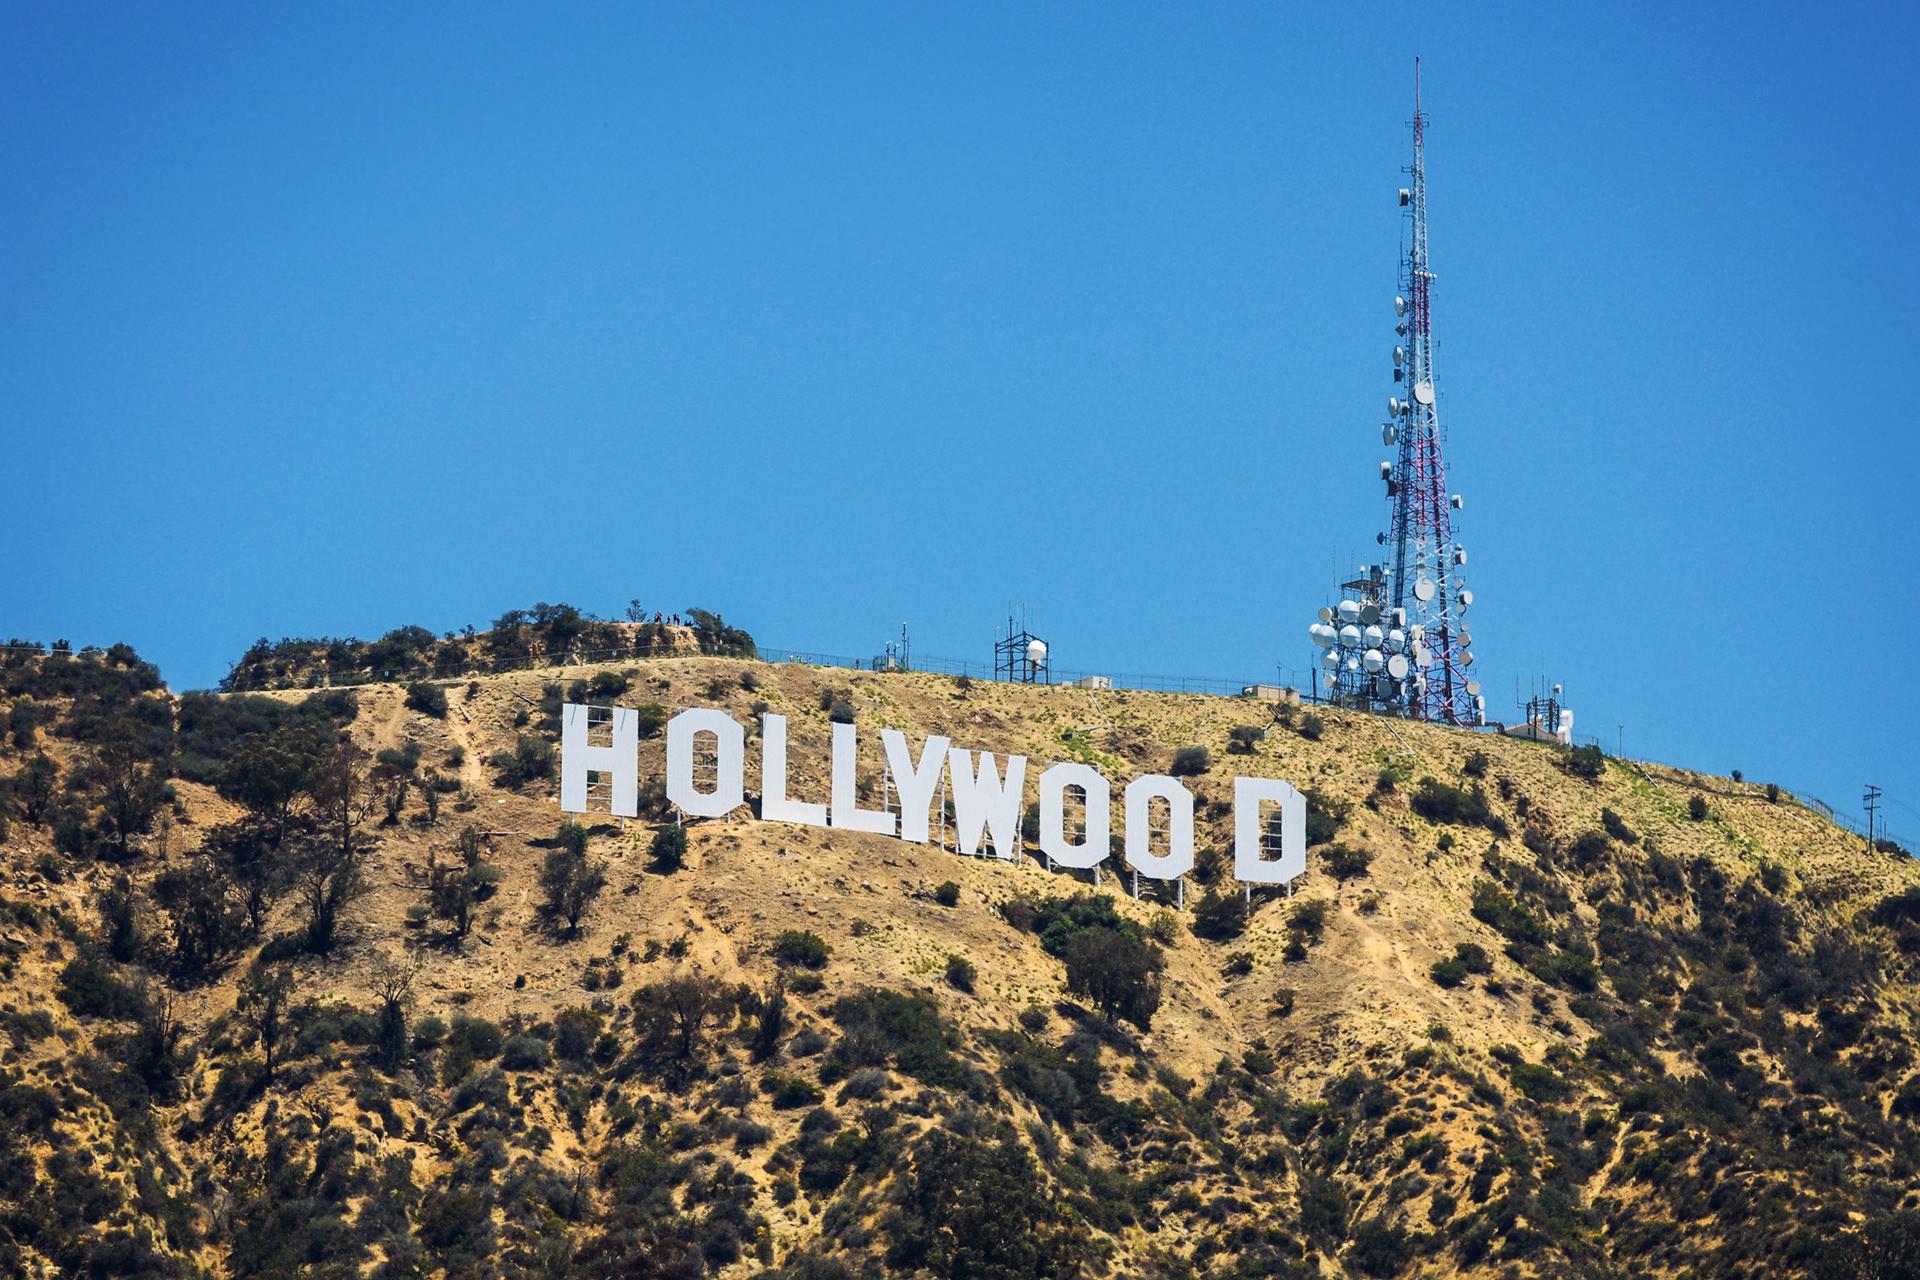 Голливуд фото картинки